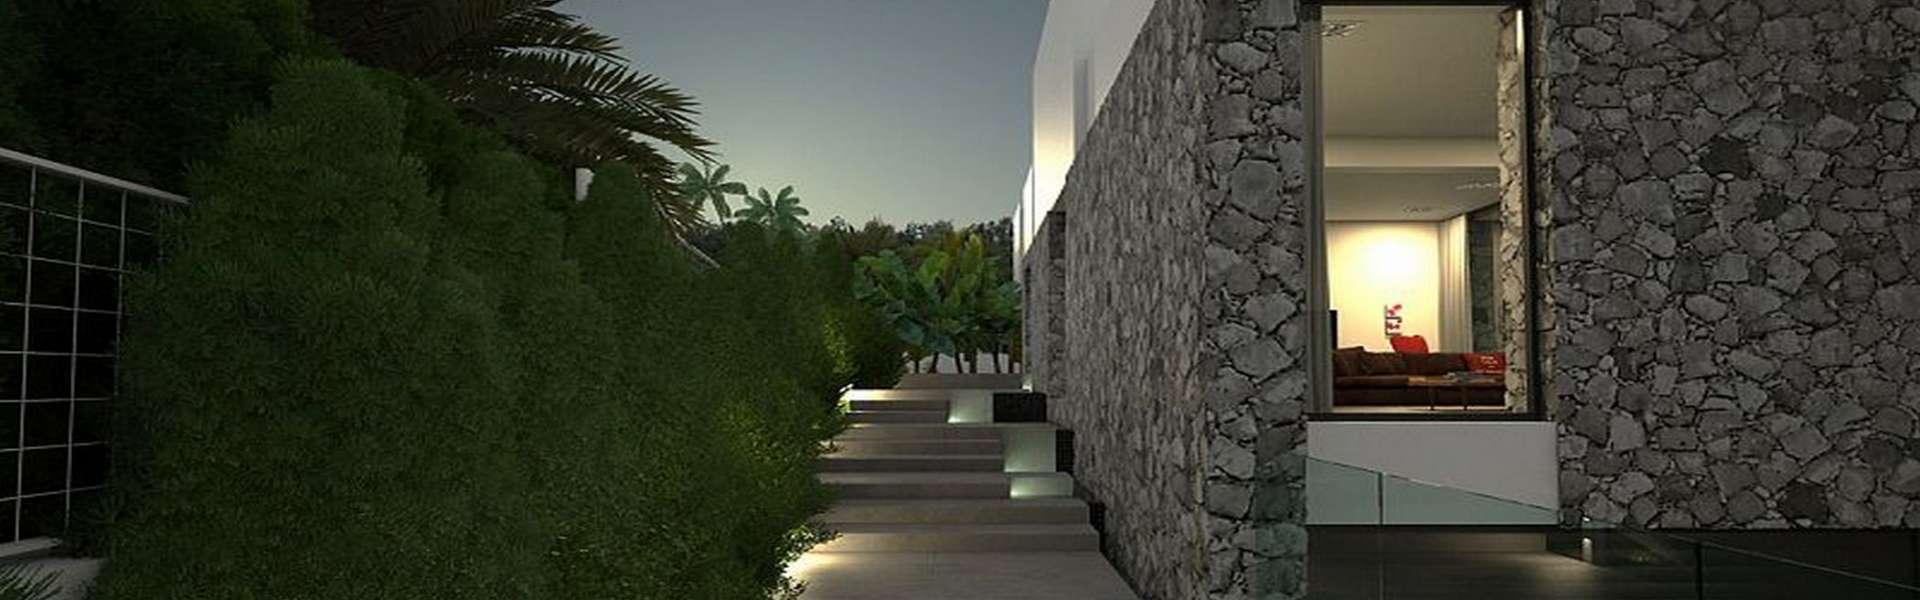 Cala Vinyes - Prestigious new construction project